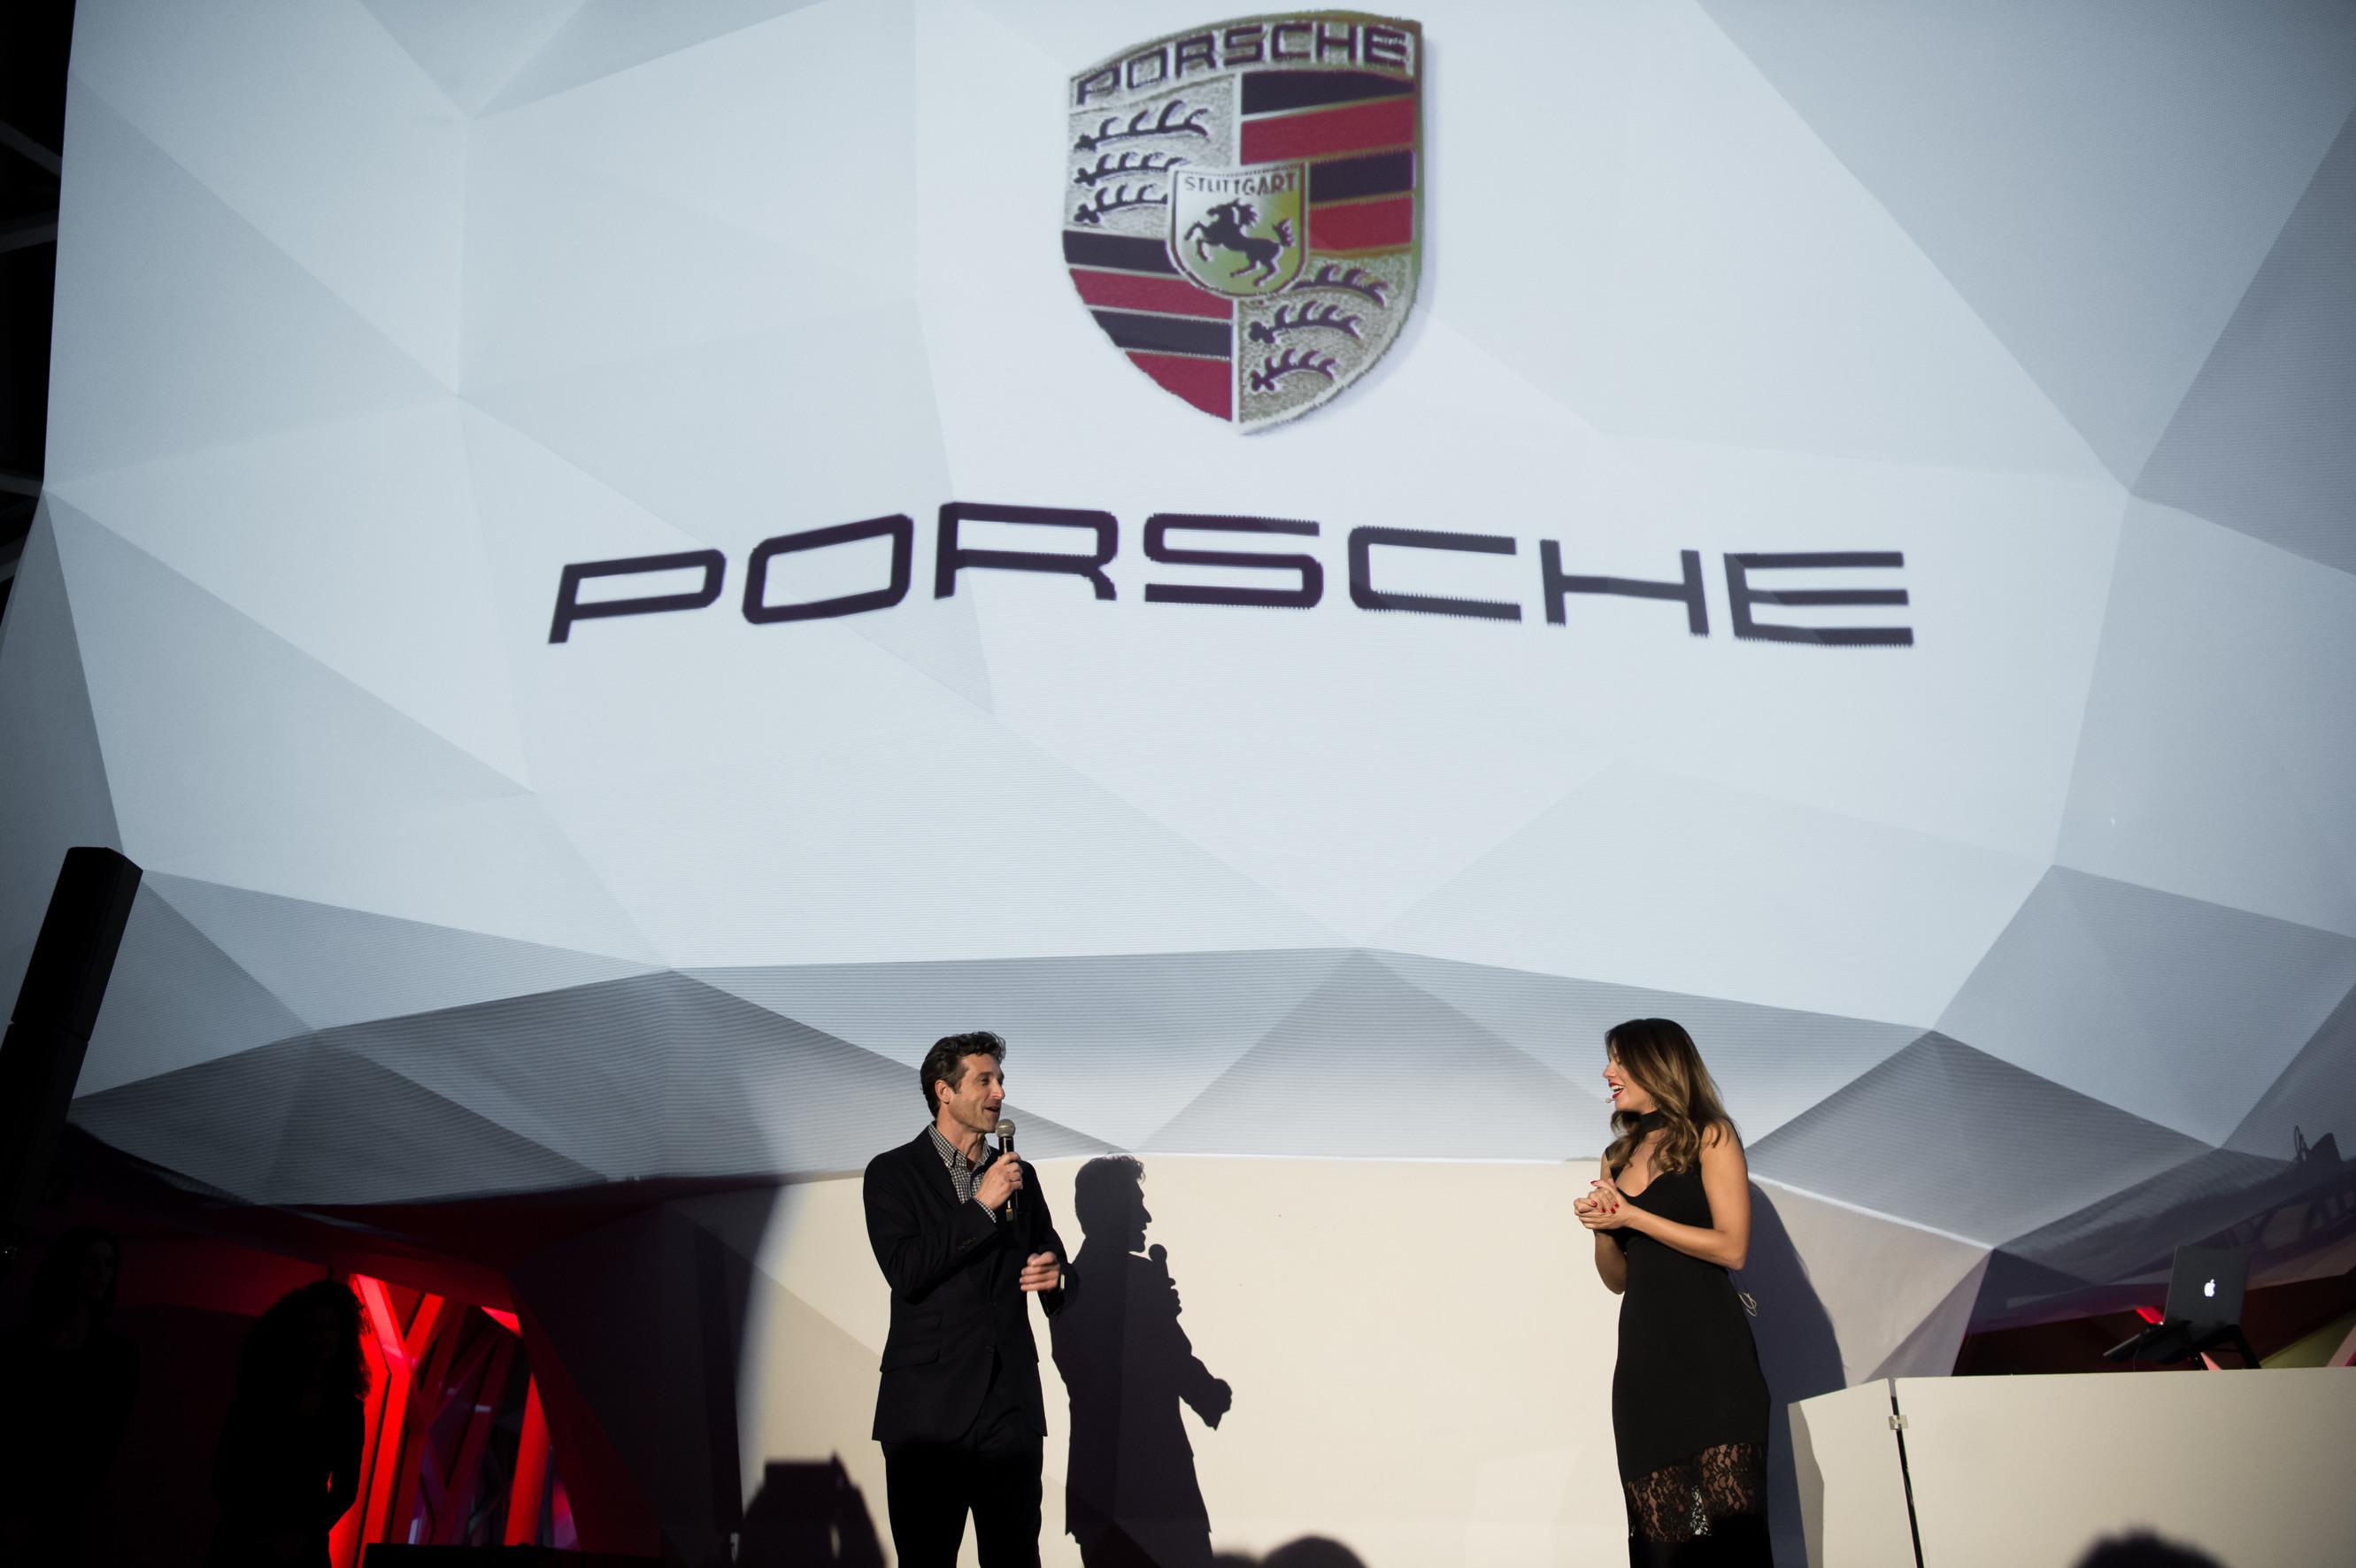 Porsche Patrick Dempsey